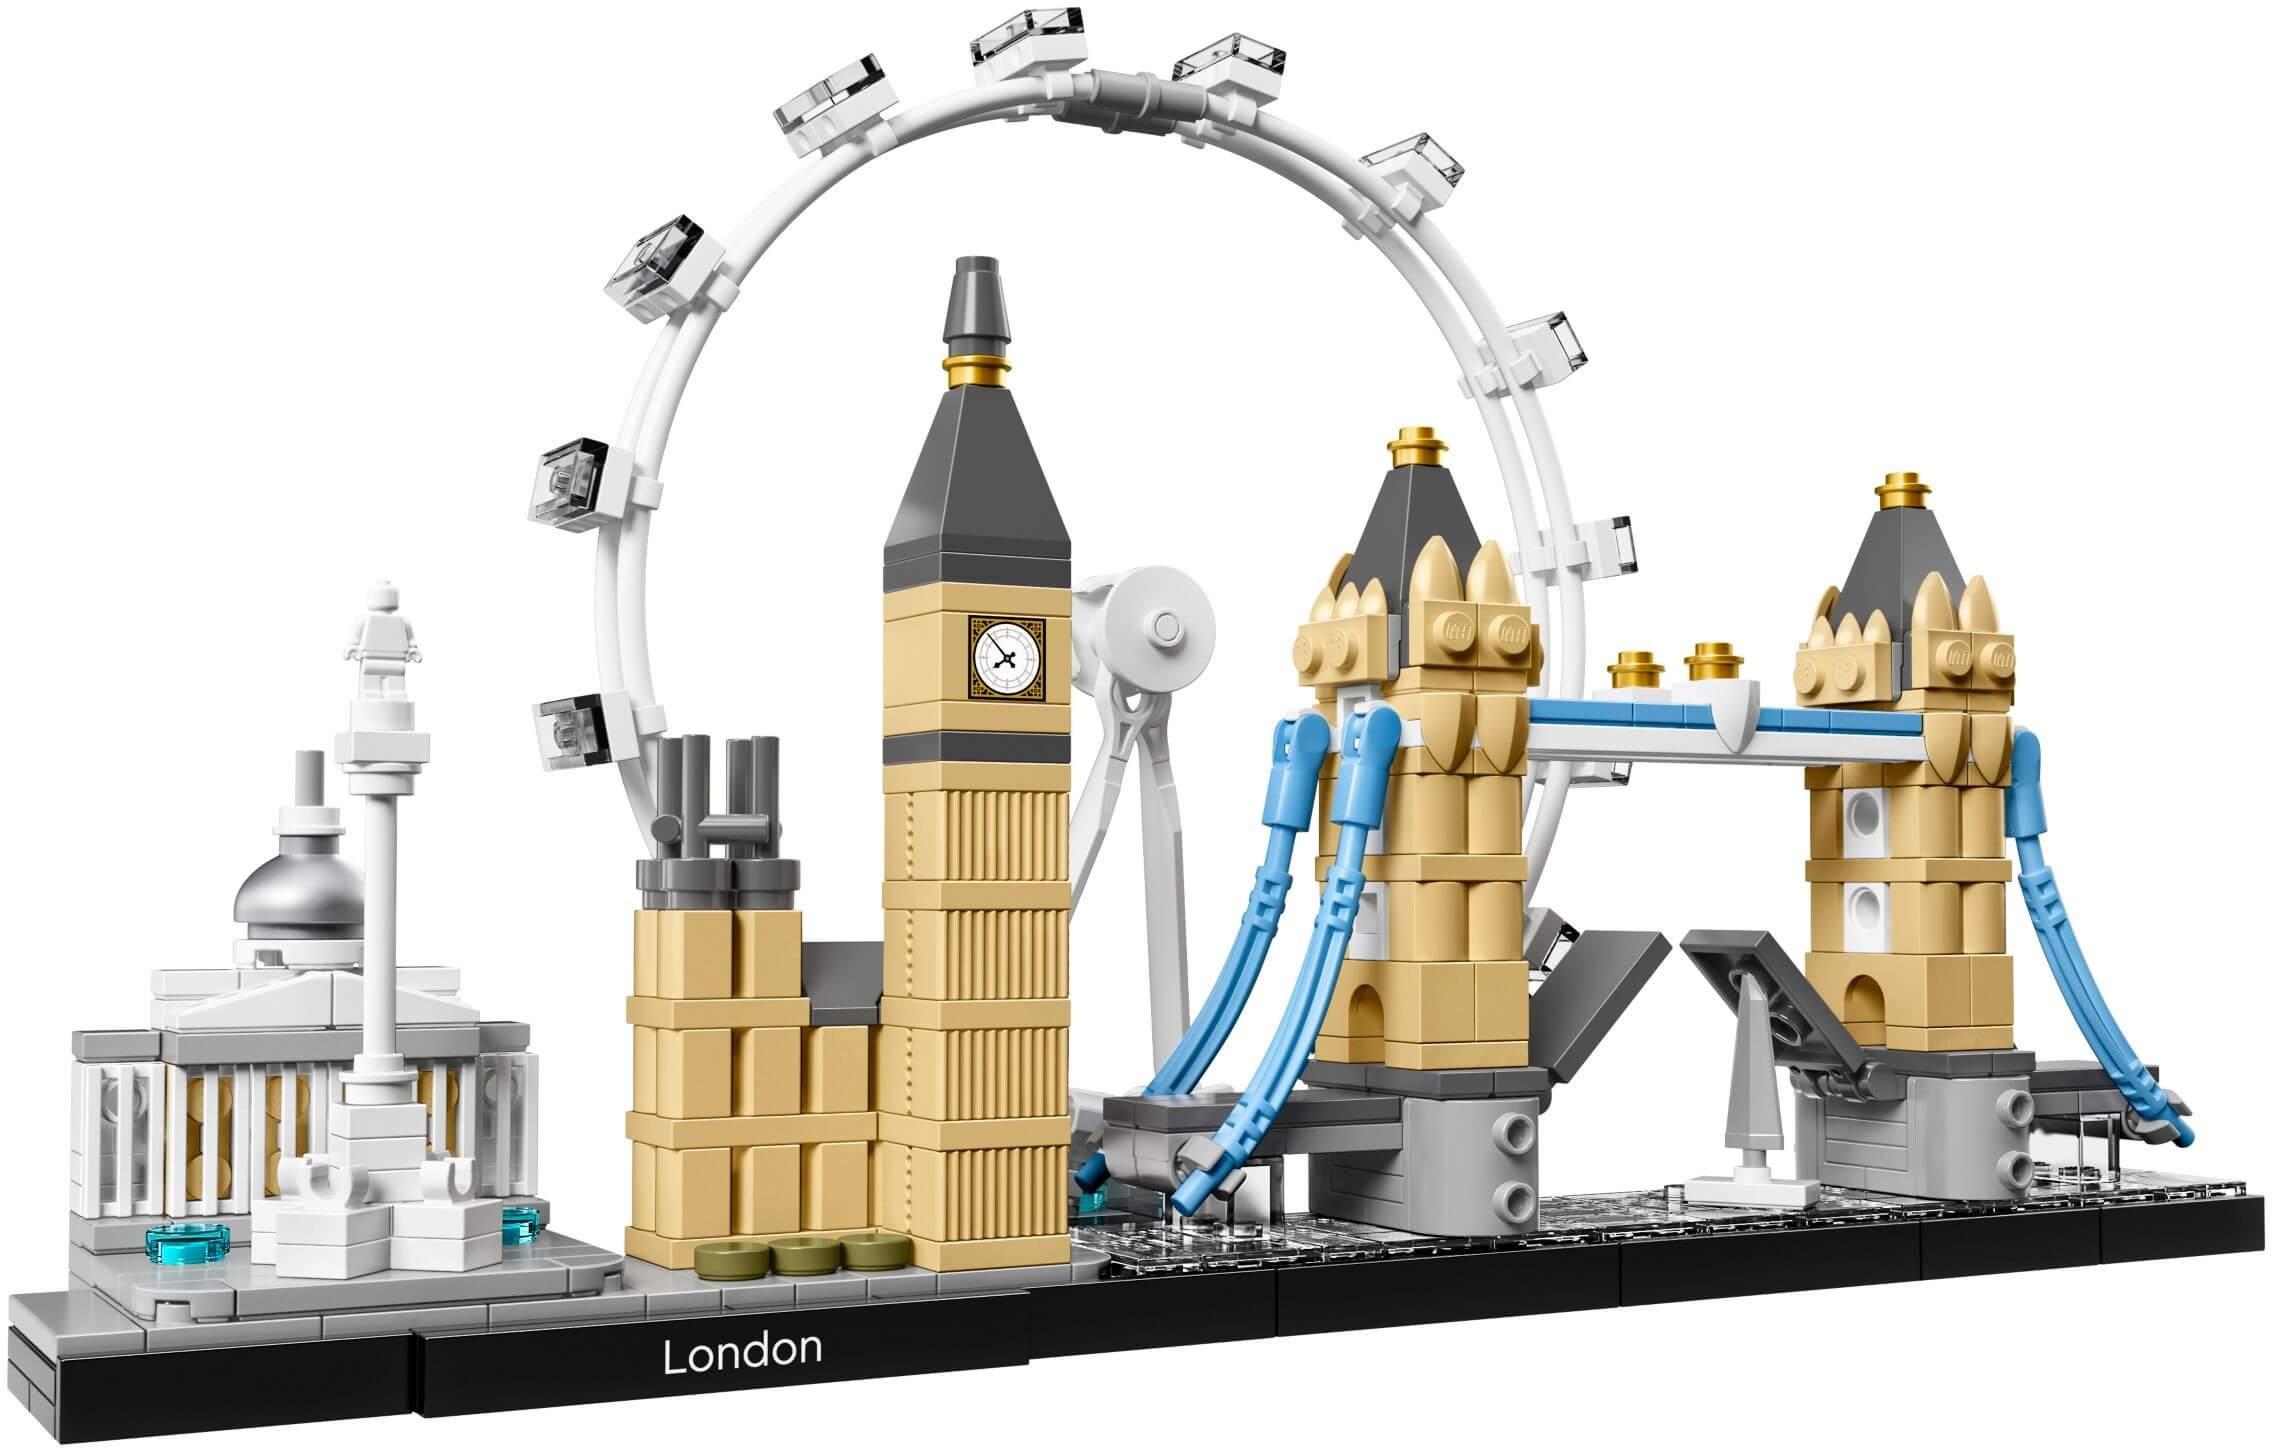 Mua đồ chơi LEGO 21034 - LEGO Architecture 21034 - Thành Phố London (LEGO 21034 London)